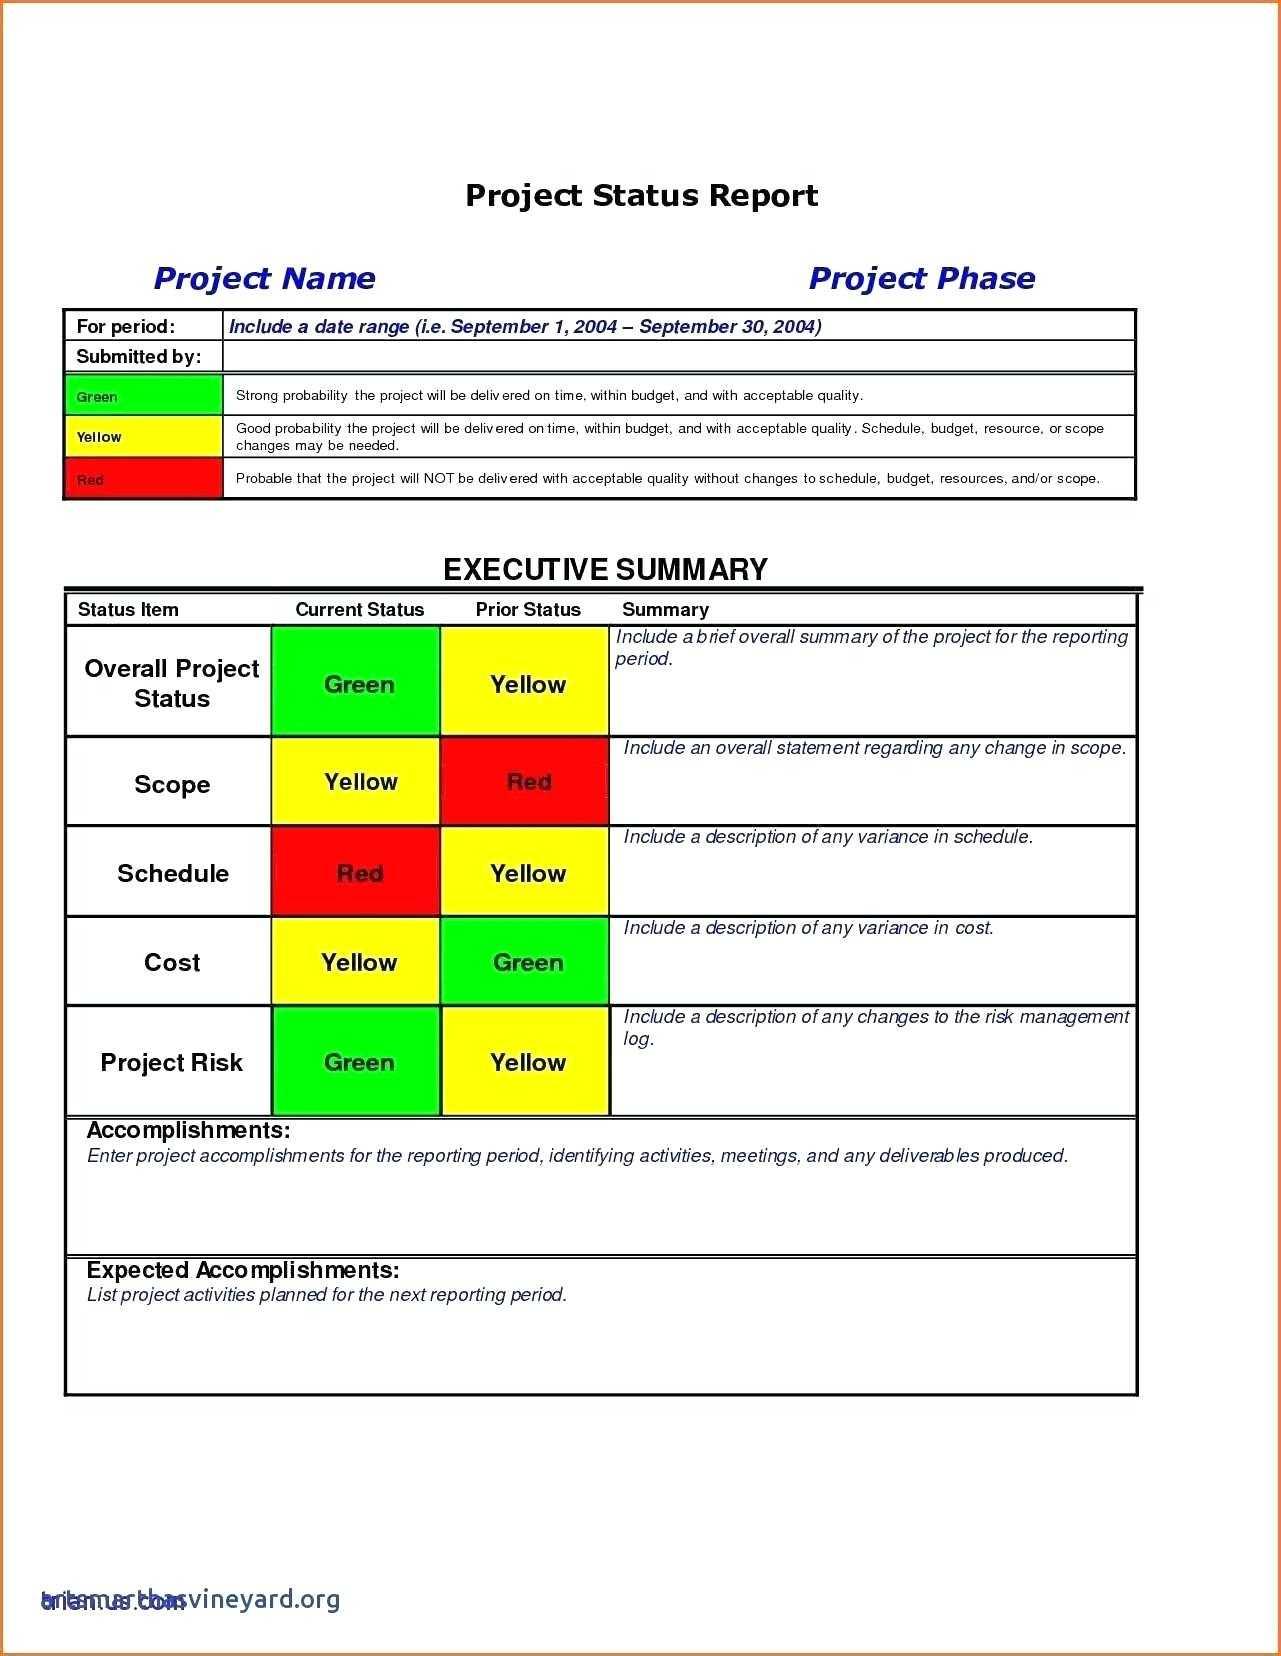 009 Project Executive Summary Template Ideas Management Throughout Executive Summary Project Status Report Template